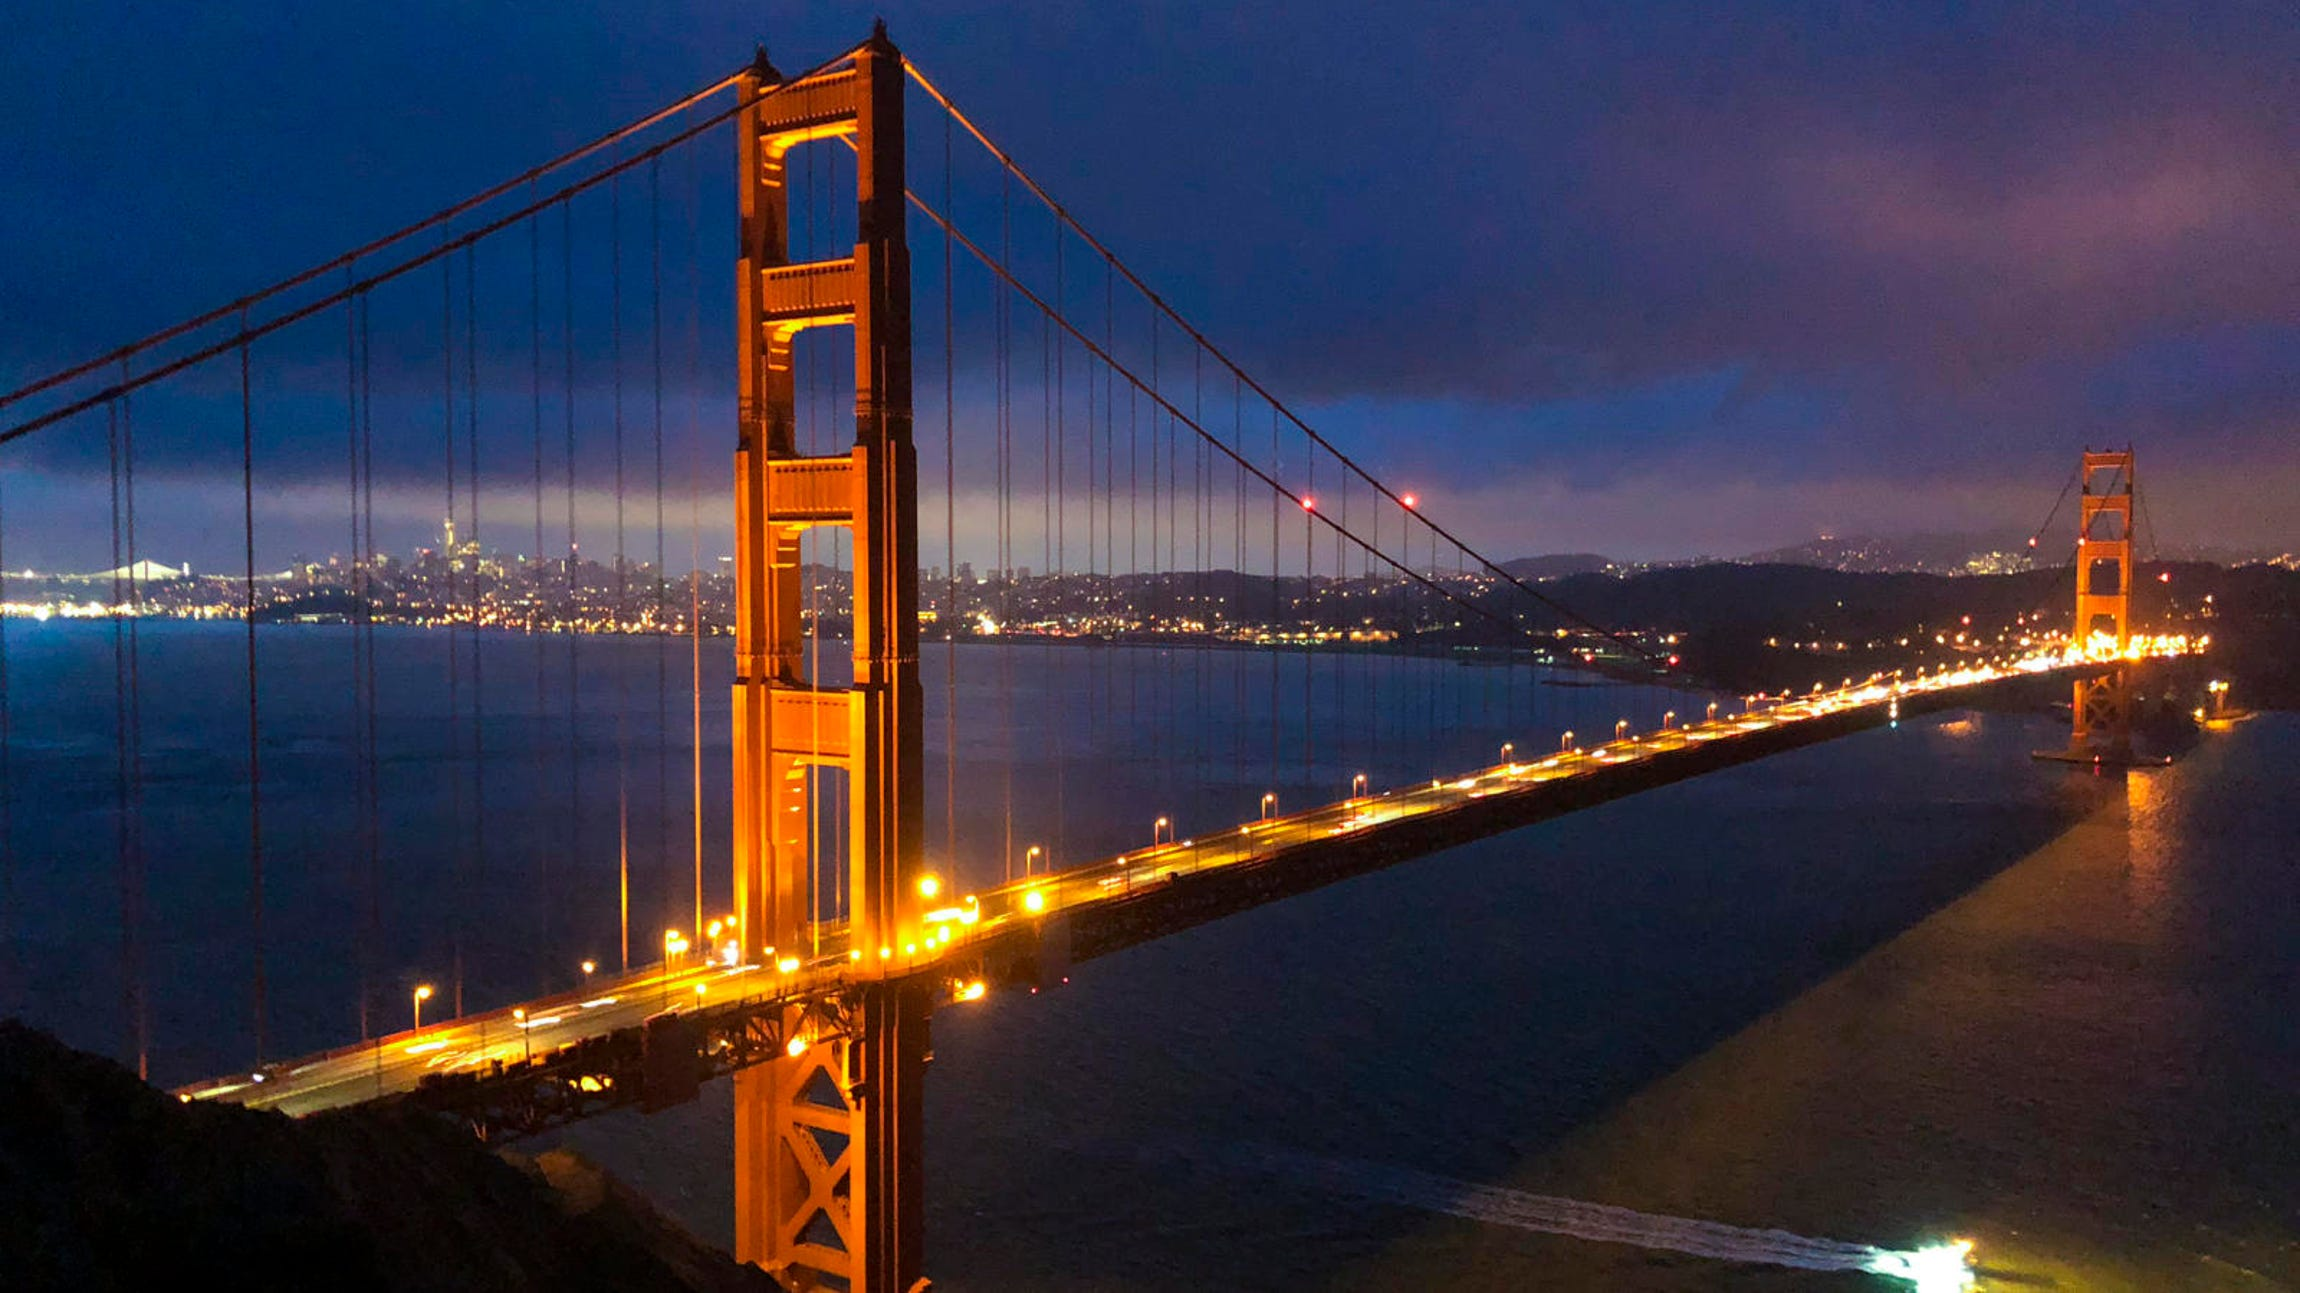 Golden Gate Bridge Shot on iPhone 8 Plus